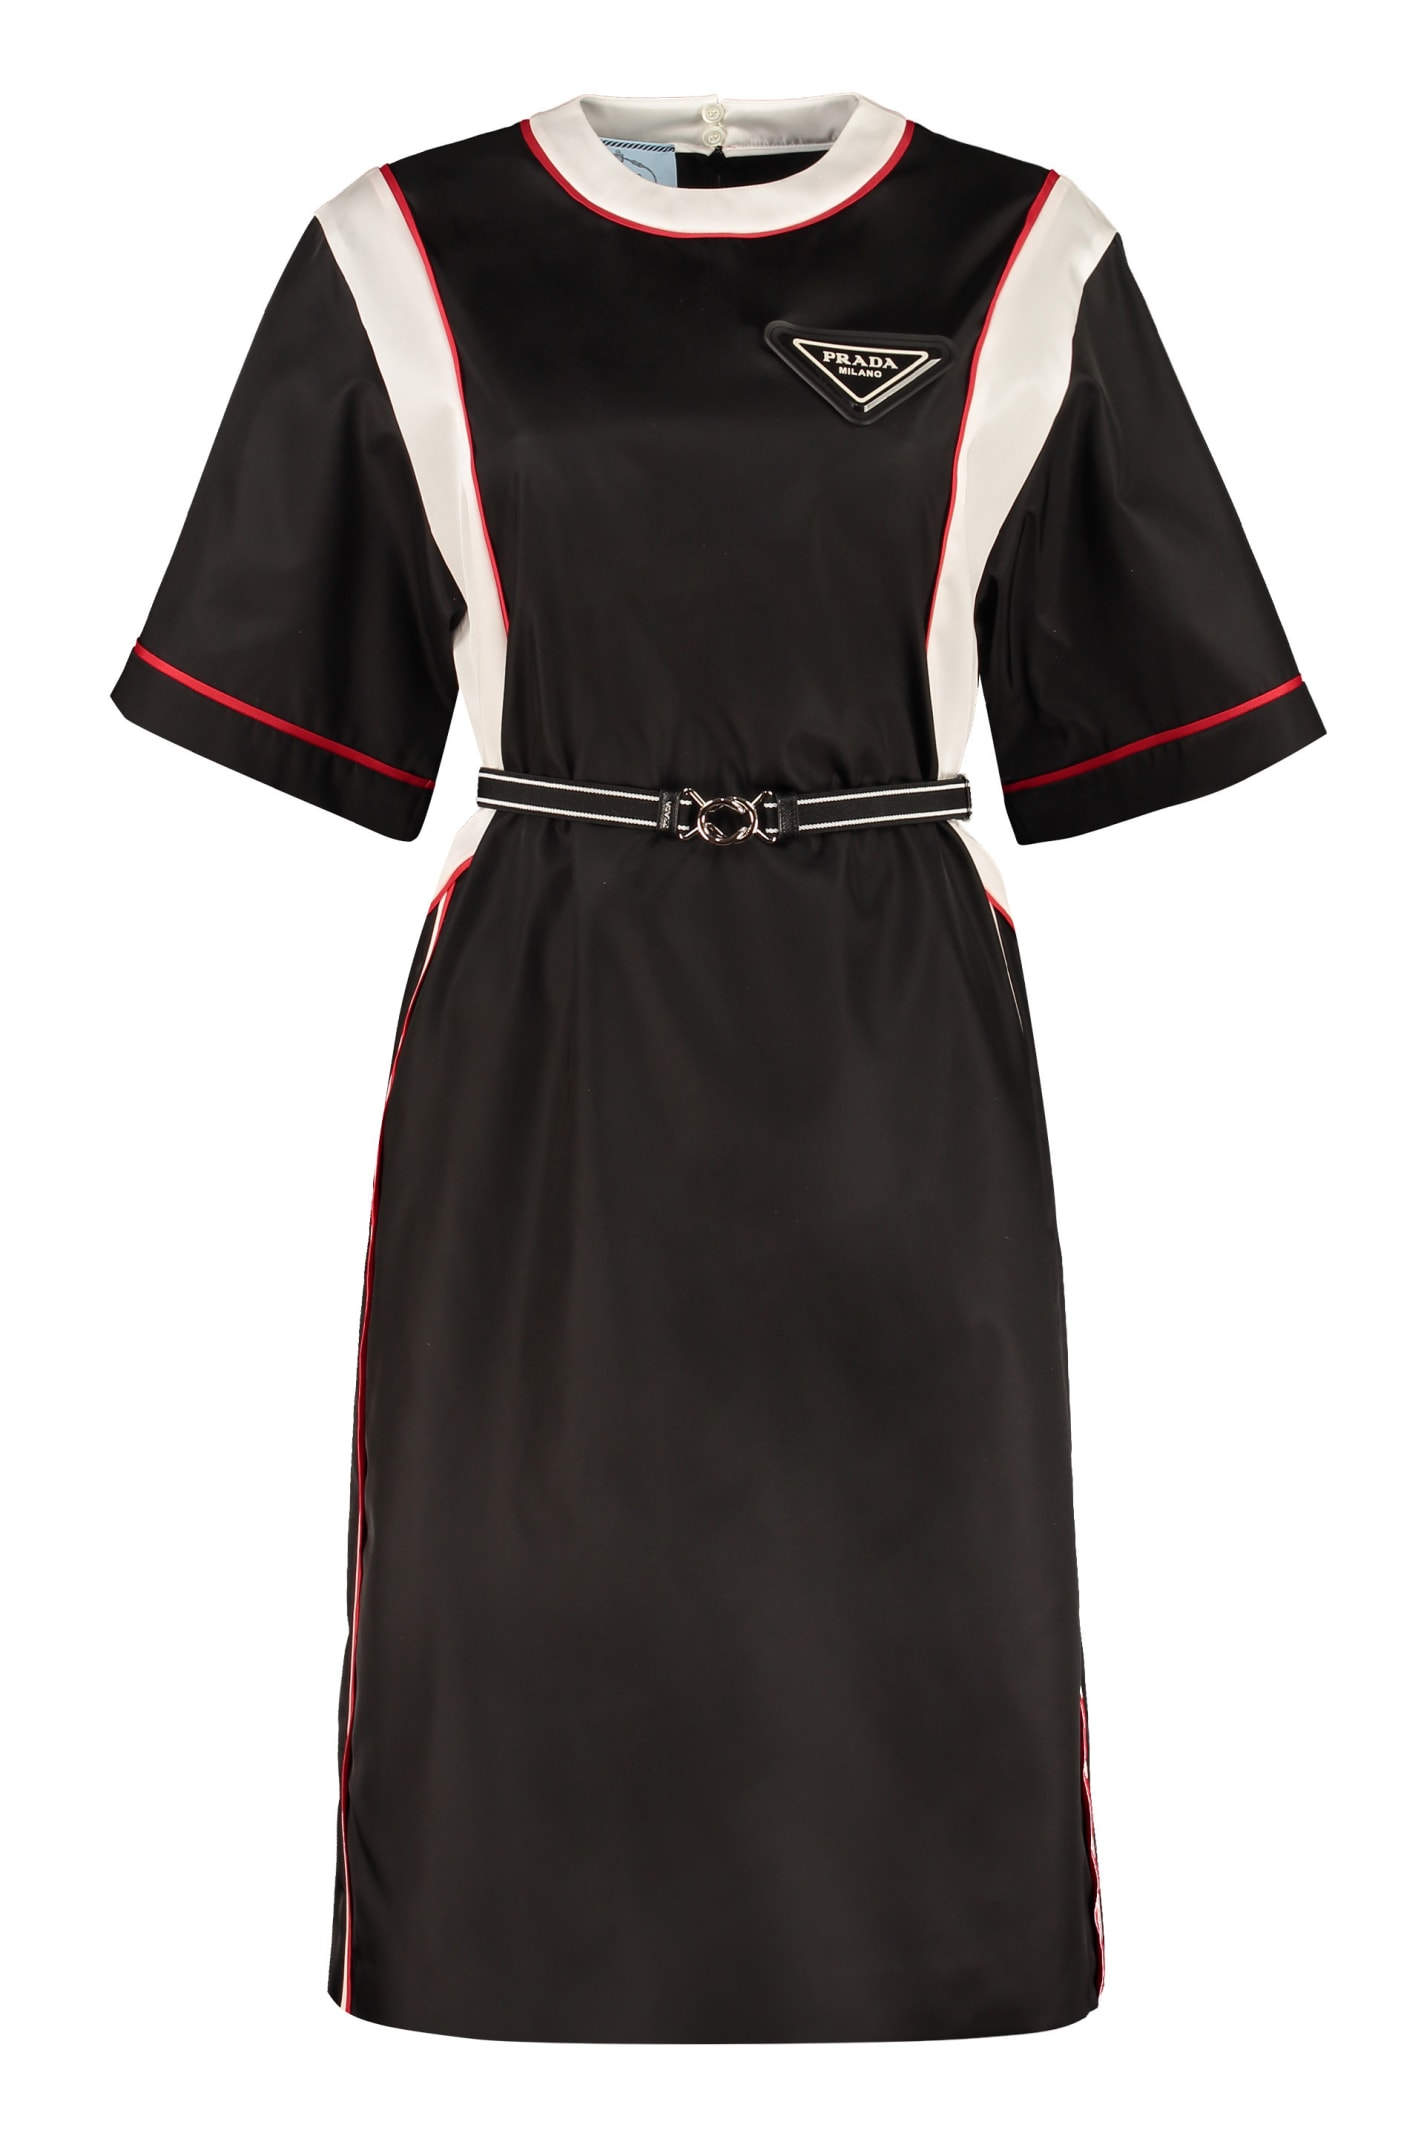 Prada Belted Nylon Dress